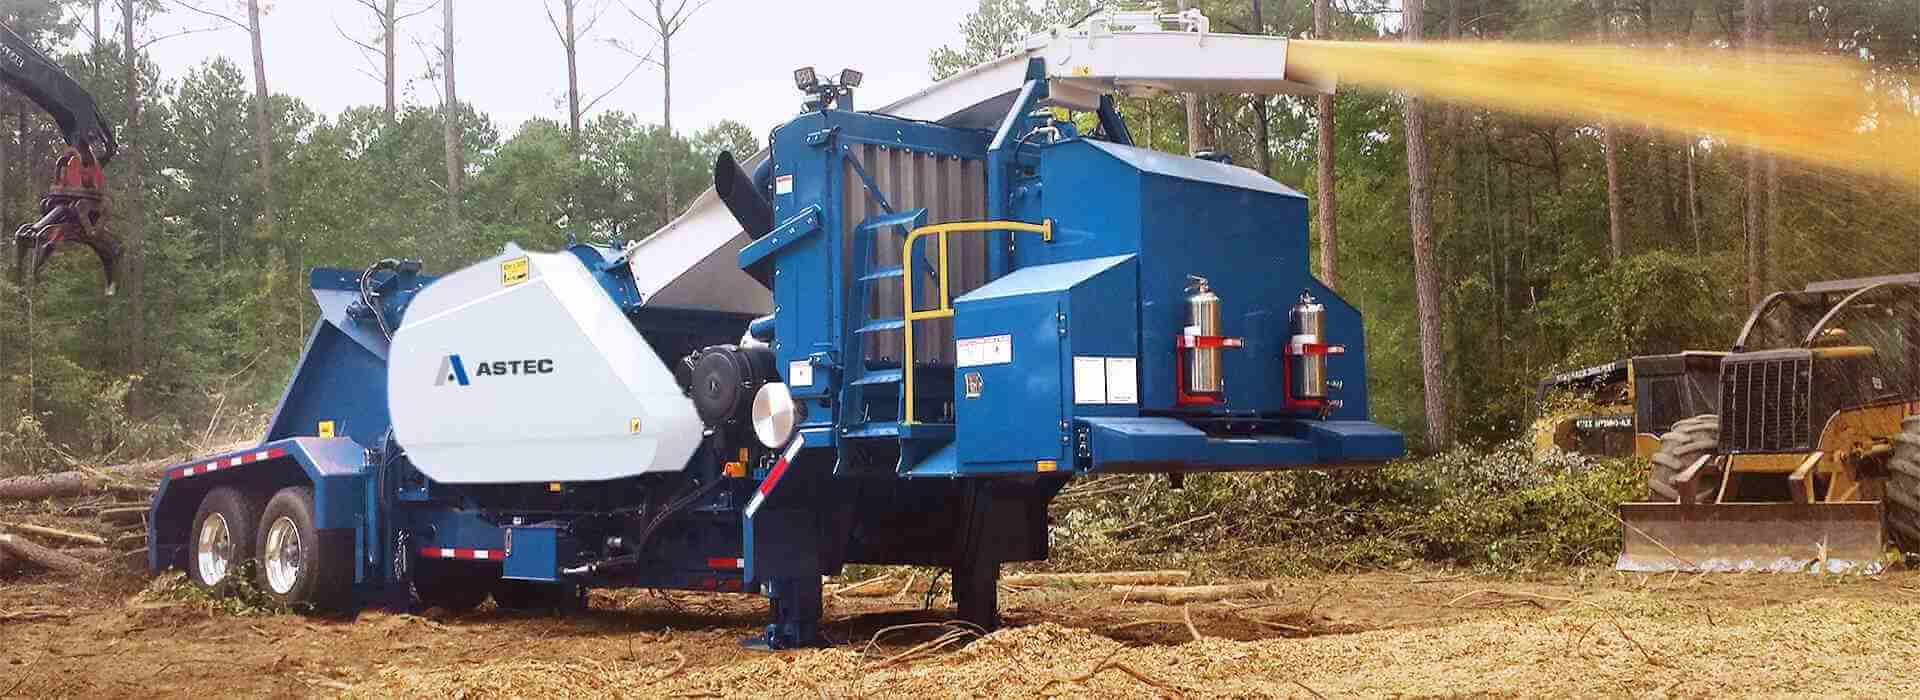 Peterson 4300B Drum Chipper making biomass chips